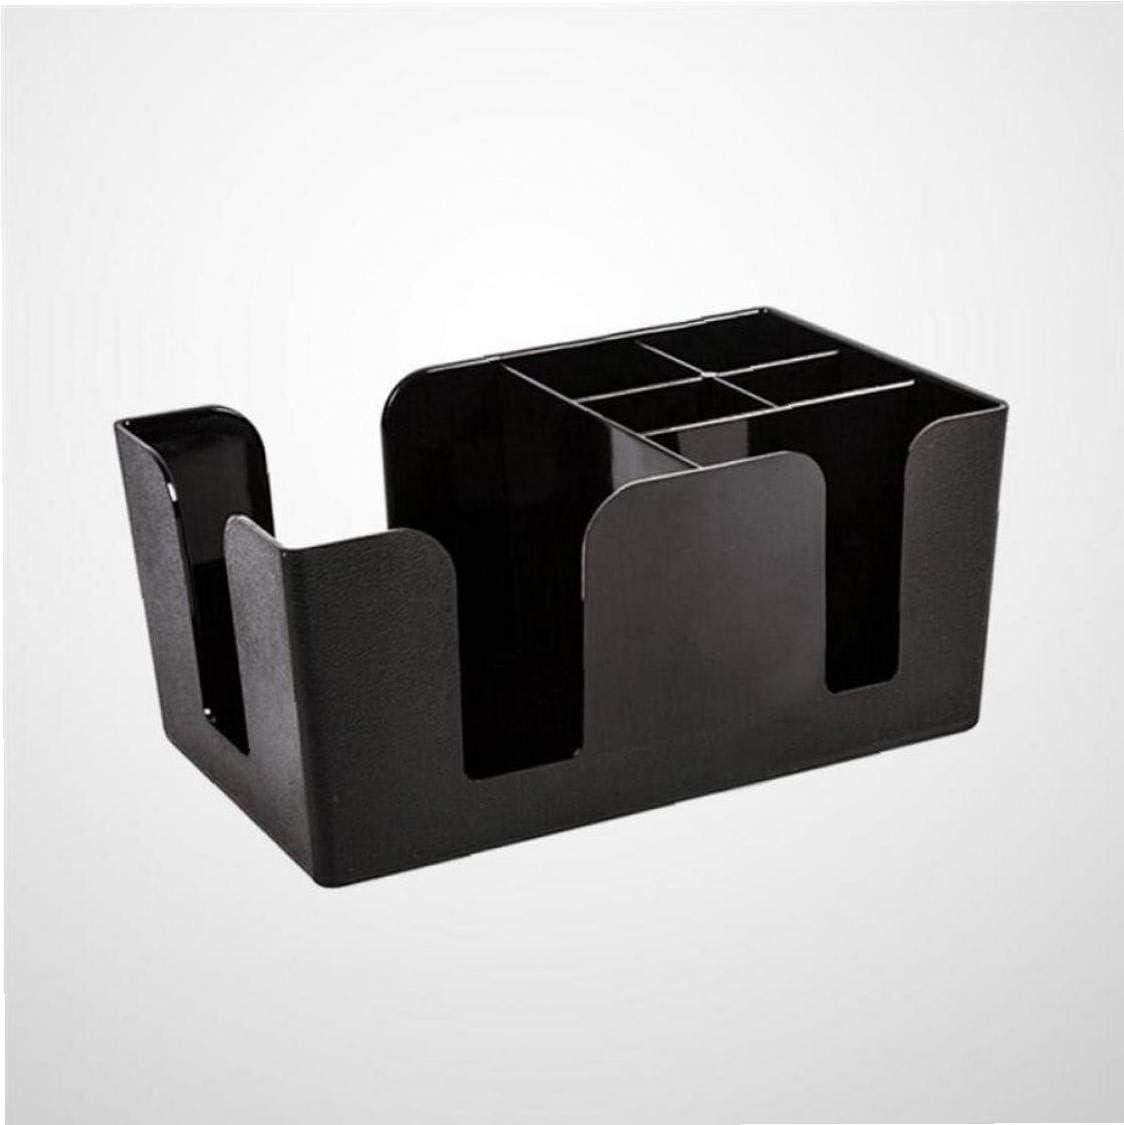 Tissue Box Strohhalme Halter Multifunktions Schwarz Kunststoff Organizer Lagerregal Box f/ür Bar Home KTV Tea Shop